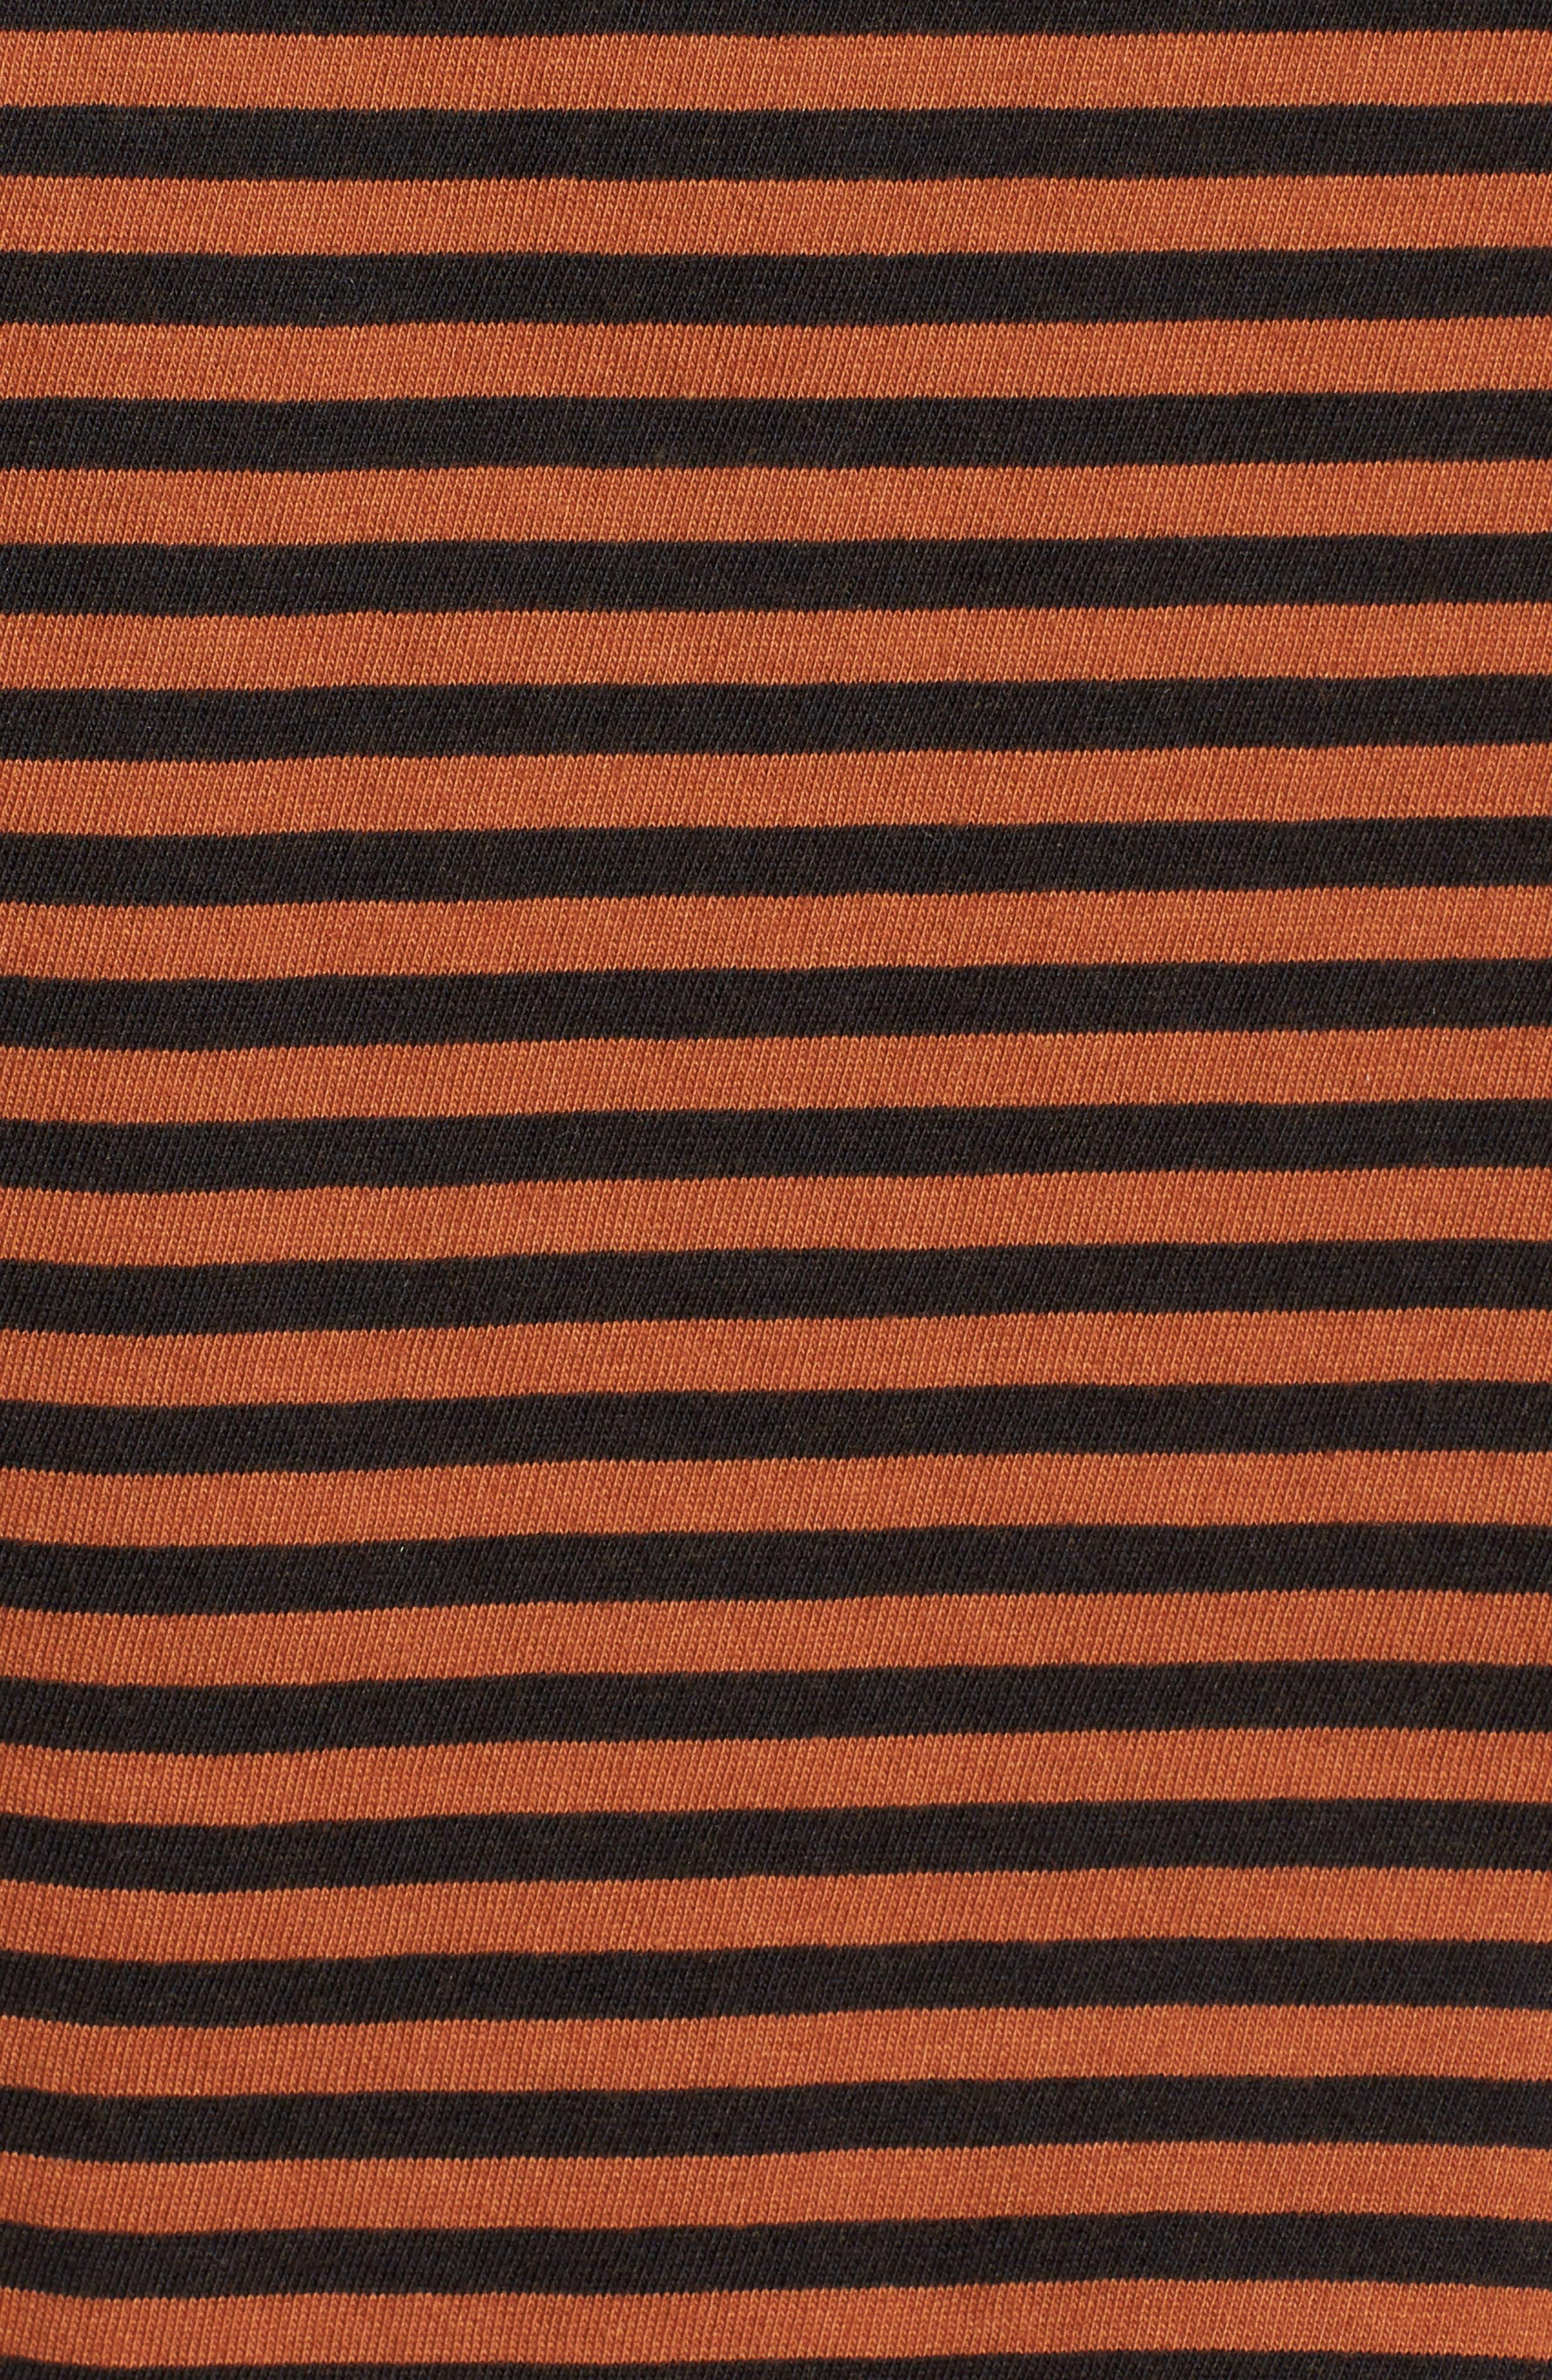 Stripe Tee,                             Alternate thumbnail 5, color,                             TOBACCO